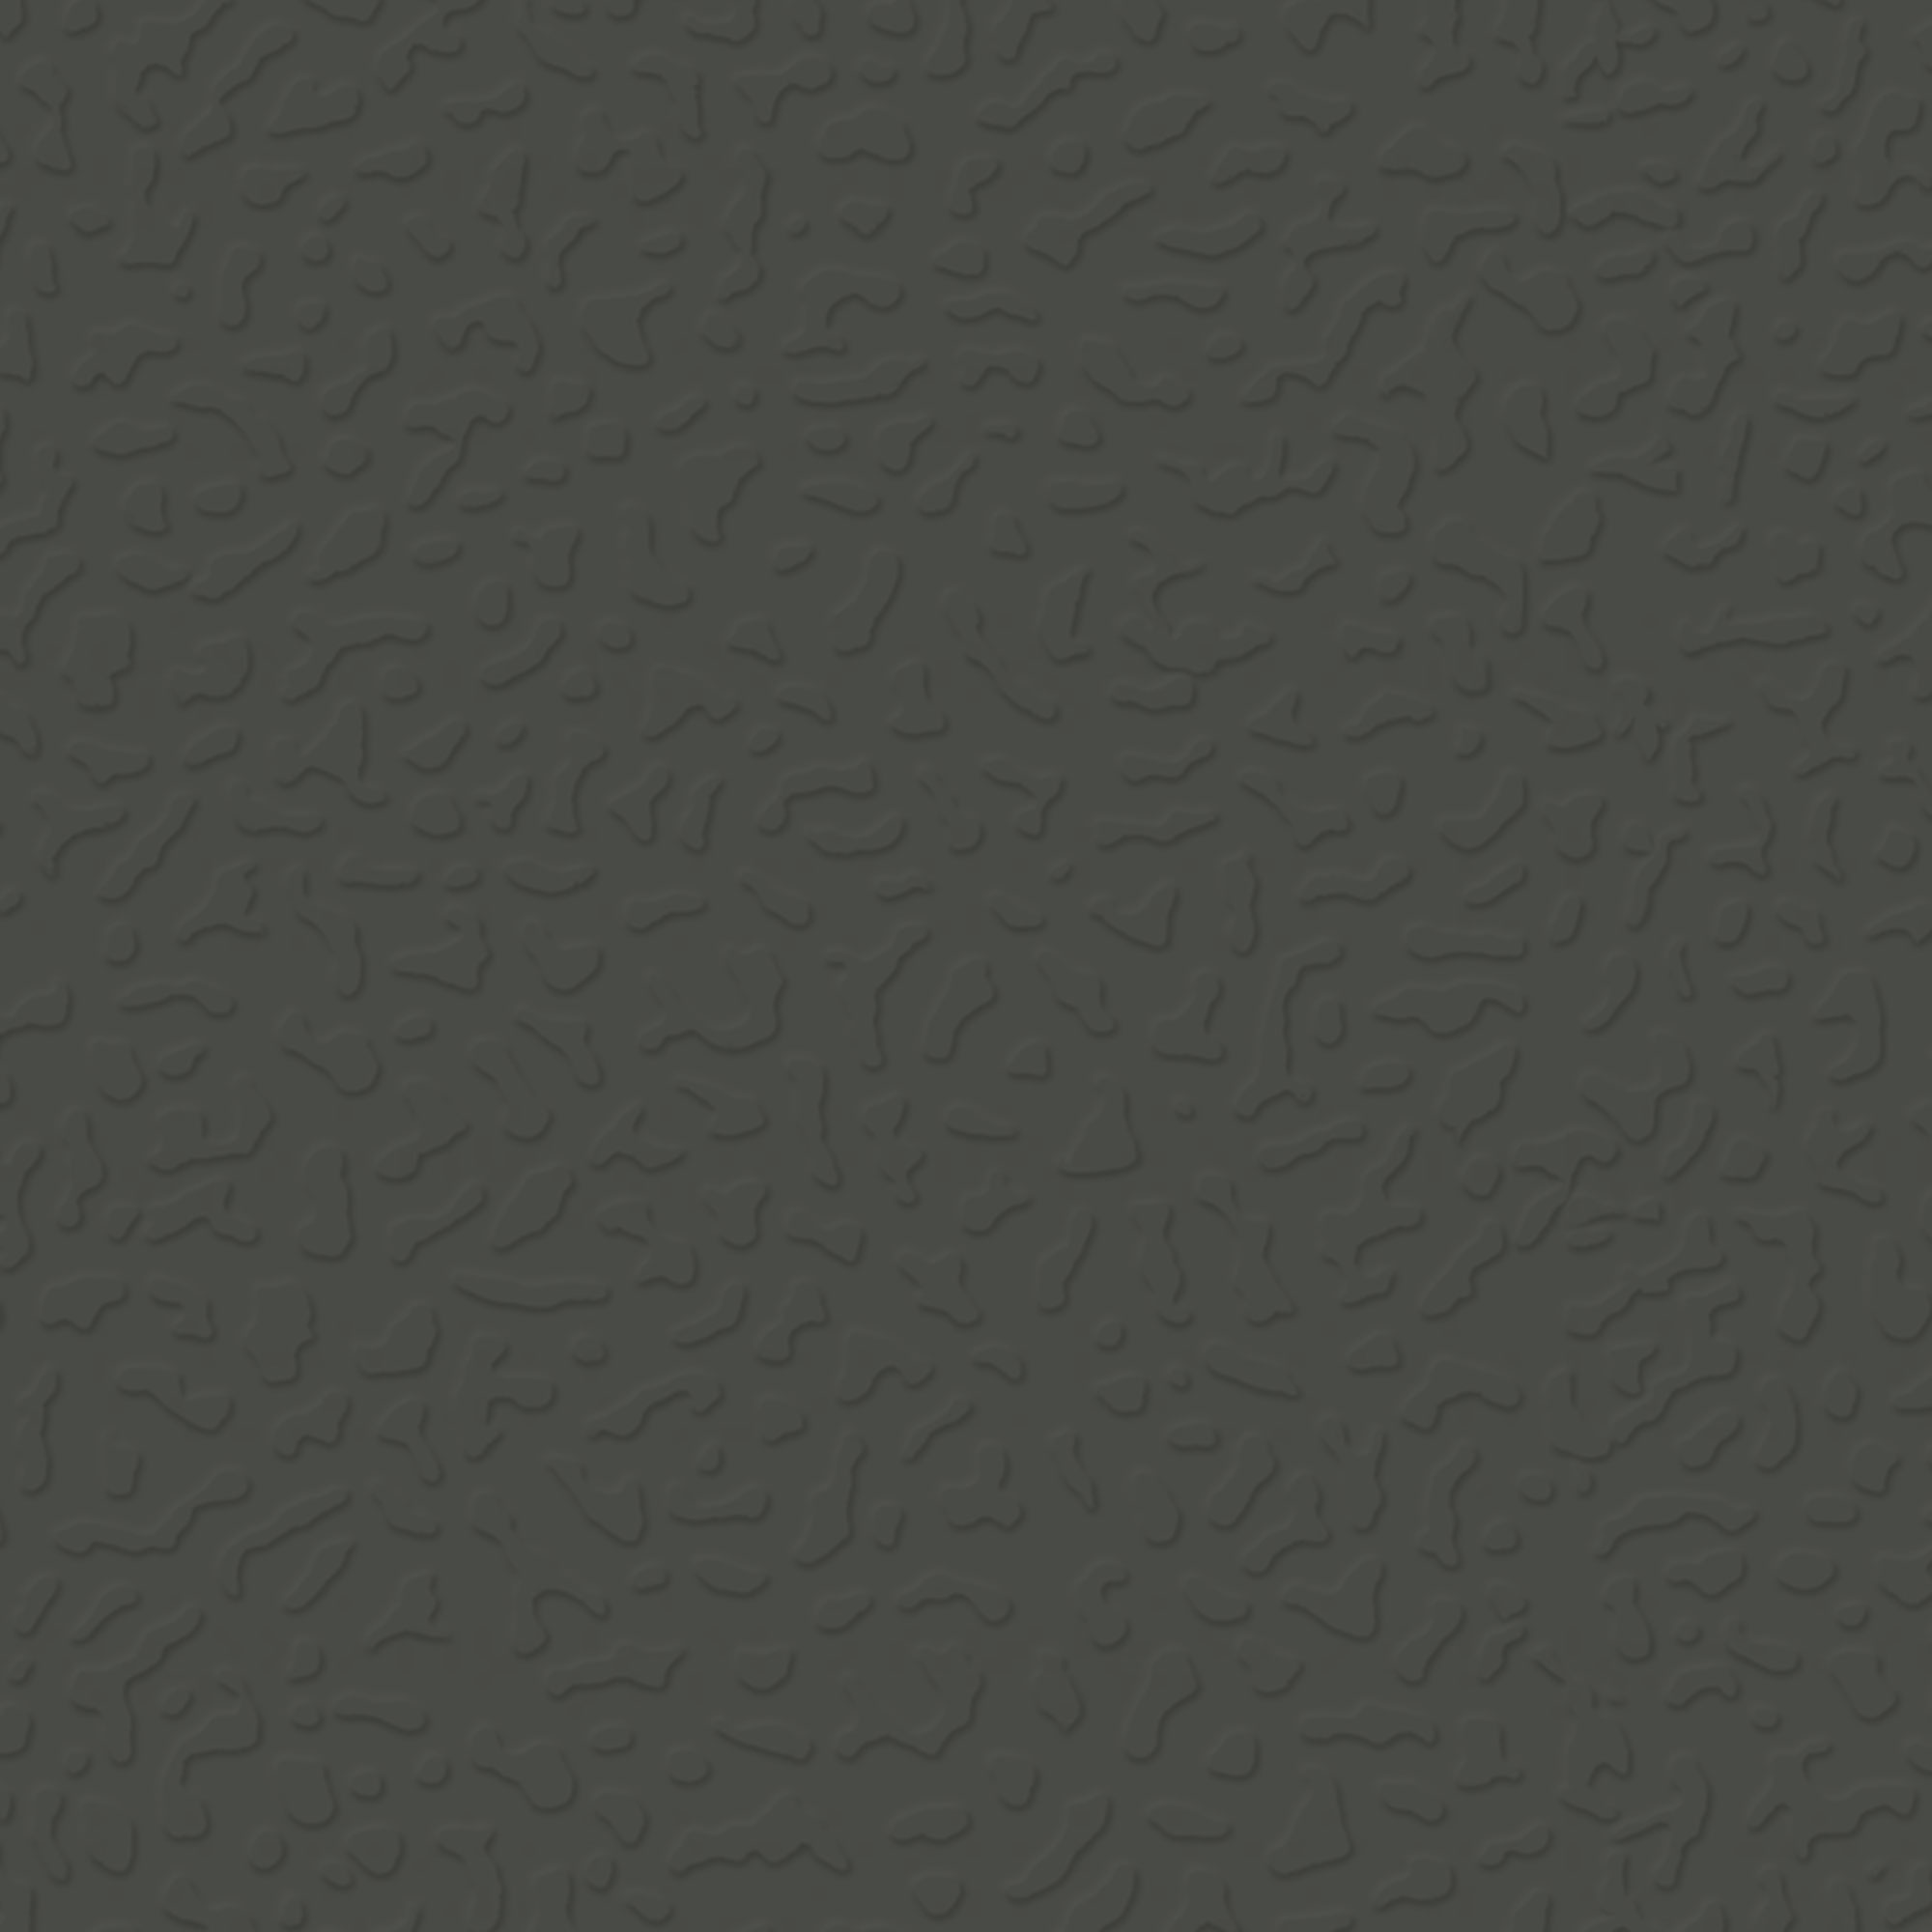 Roppe Rubber Tile 900 - Textured Design (993) Black Brown Rubber Flooring